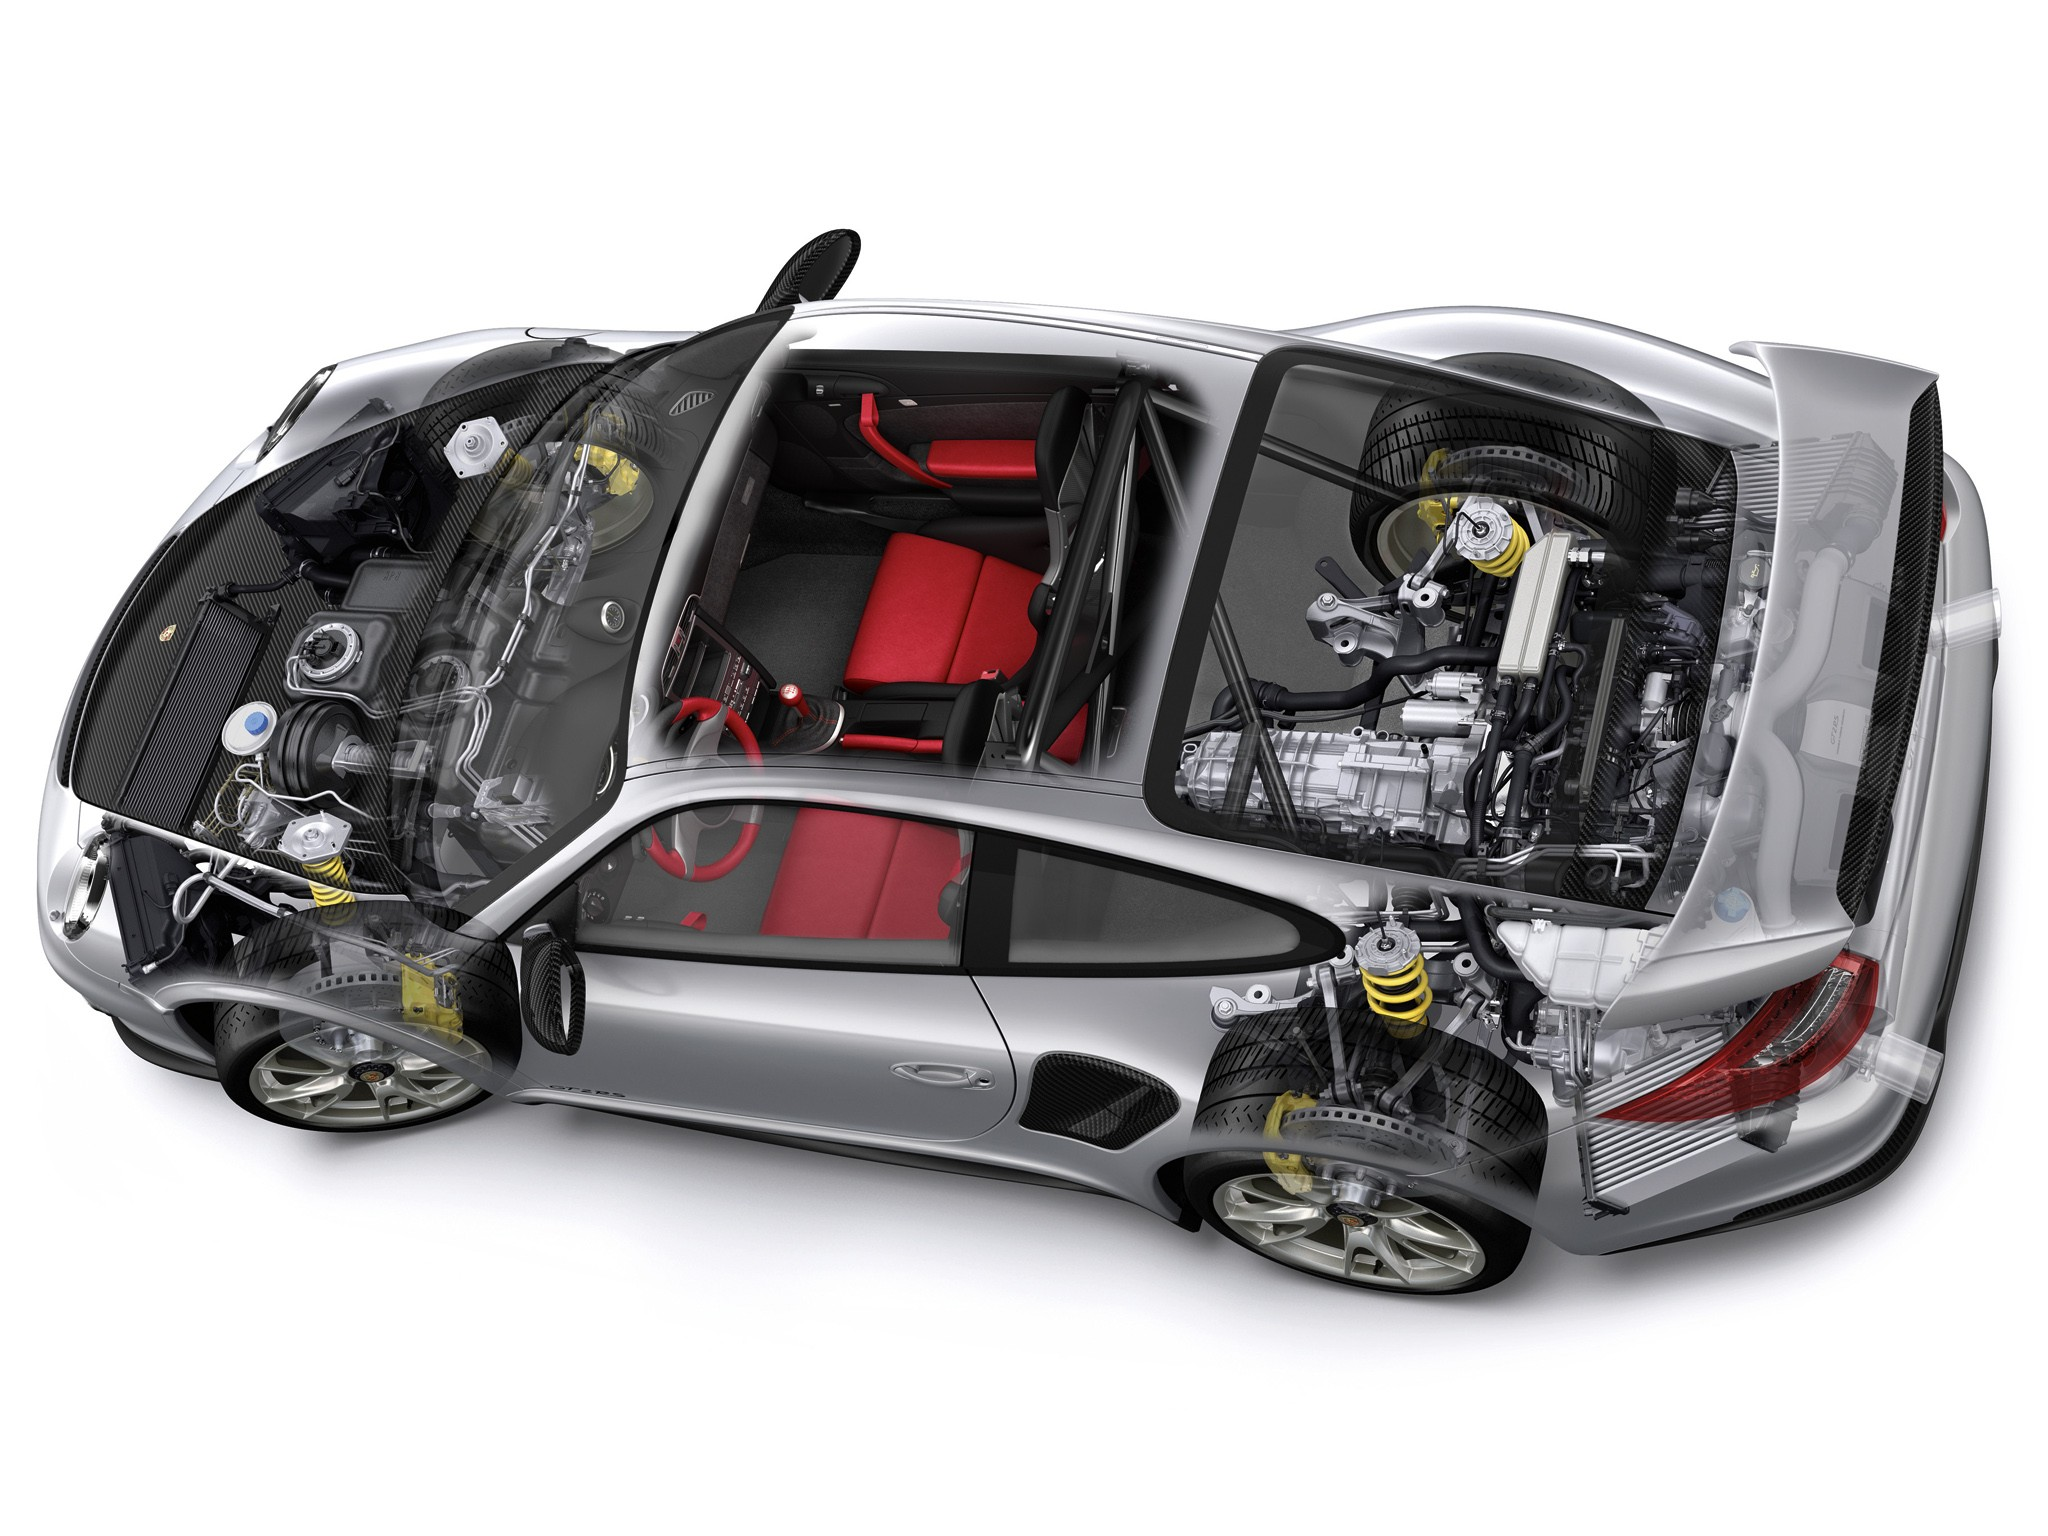 PORSCHE-911-GT2-RS-4327_15 Amazing Porsche 911 Gt2 Rs Engine Cars Trend